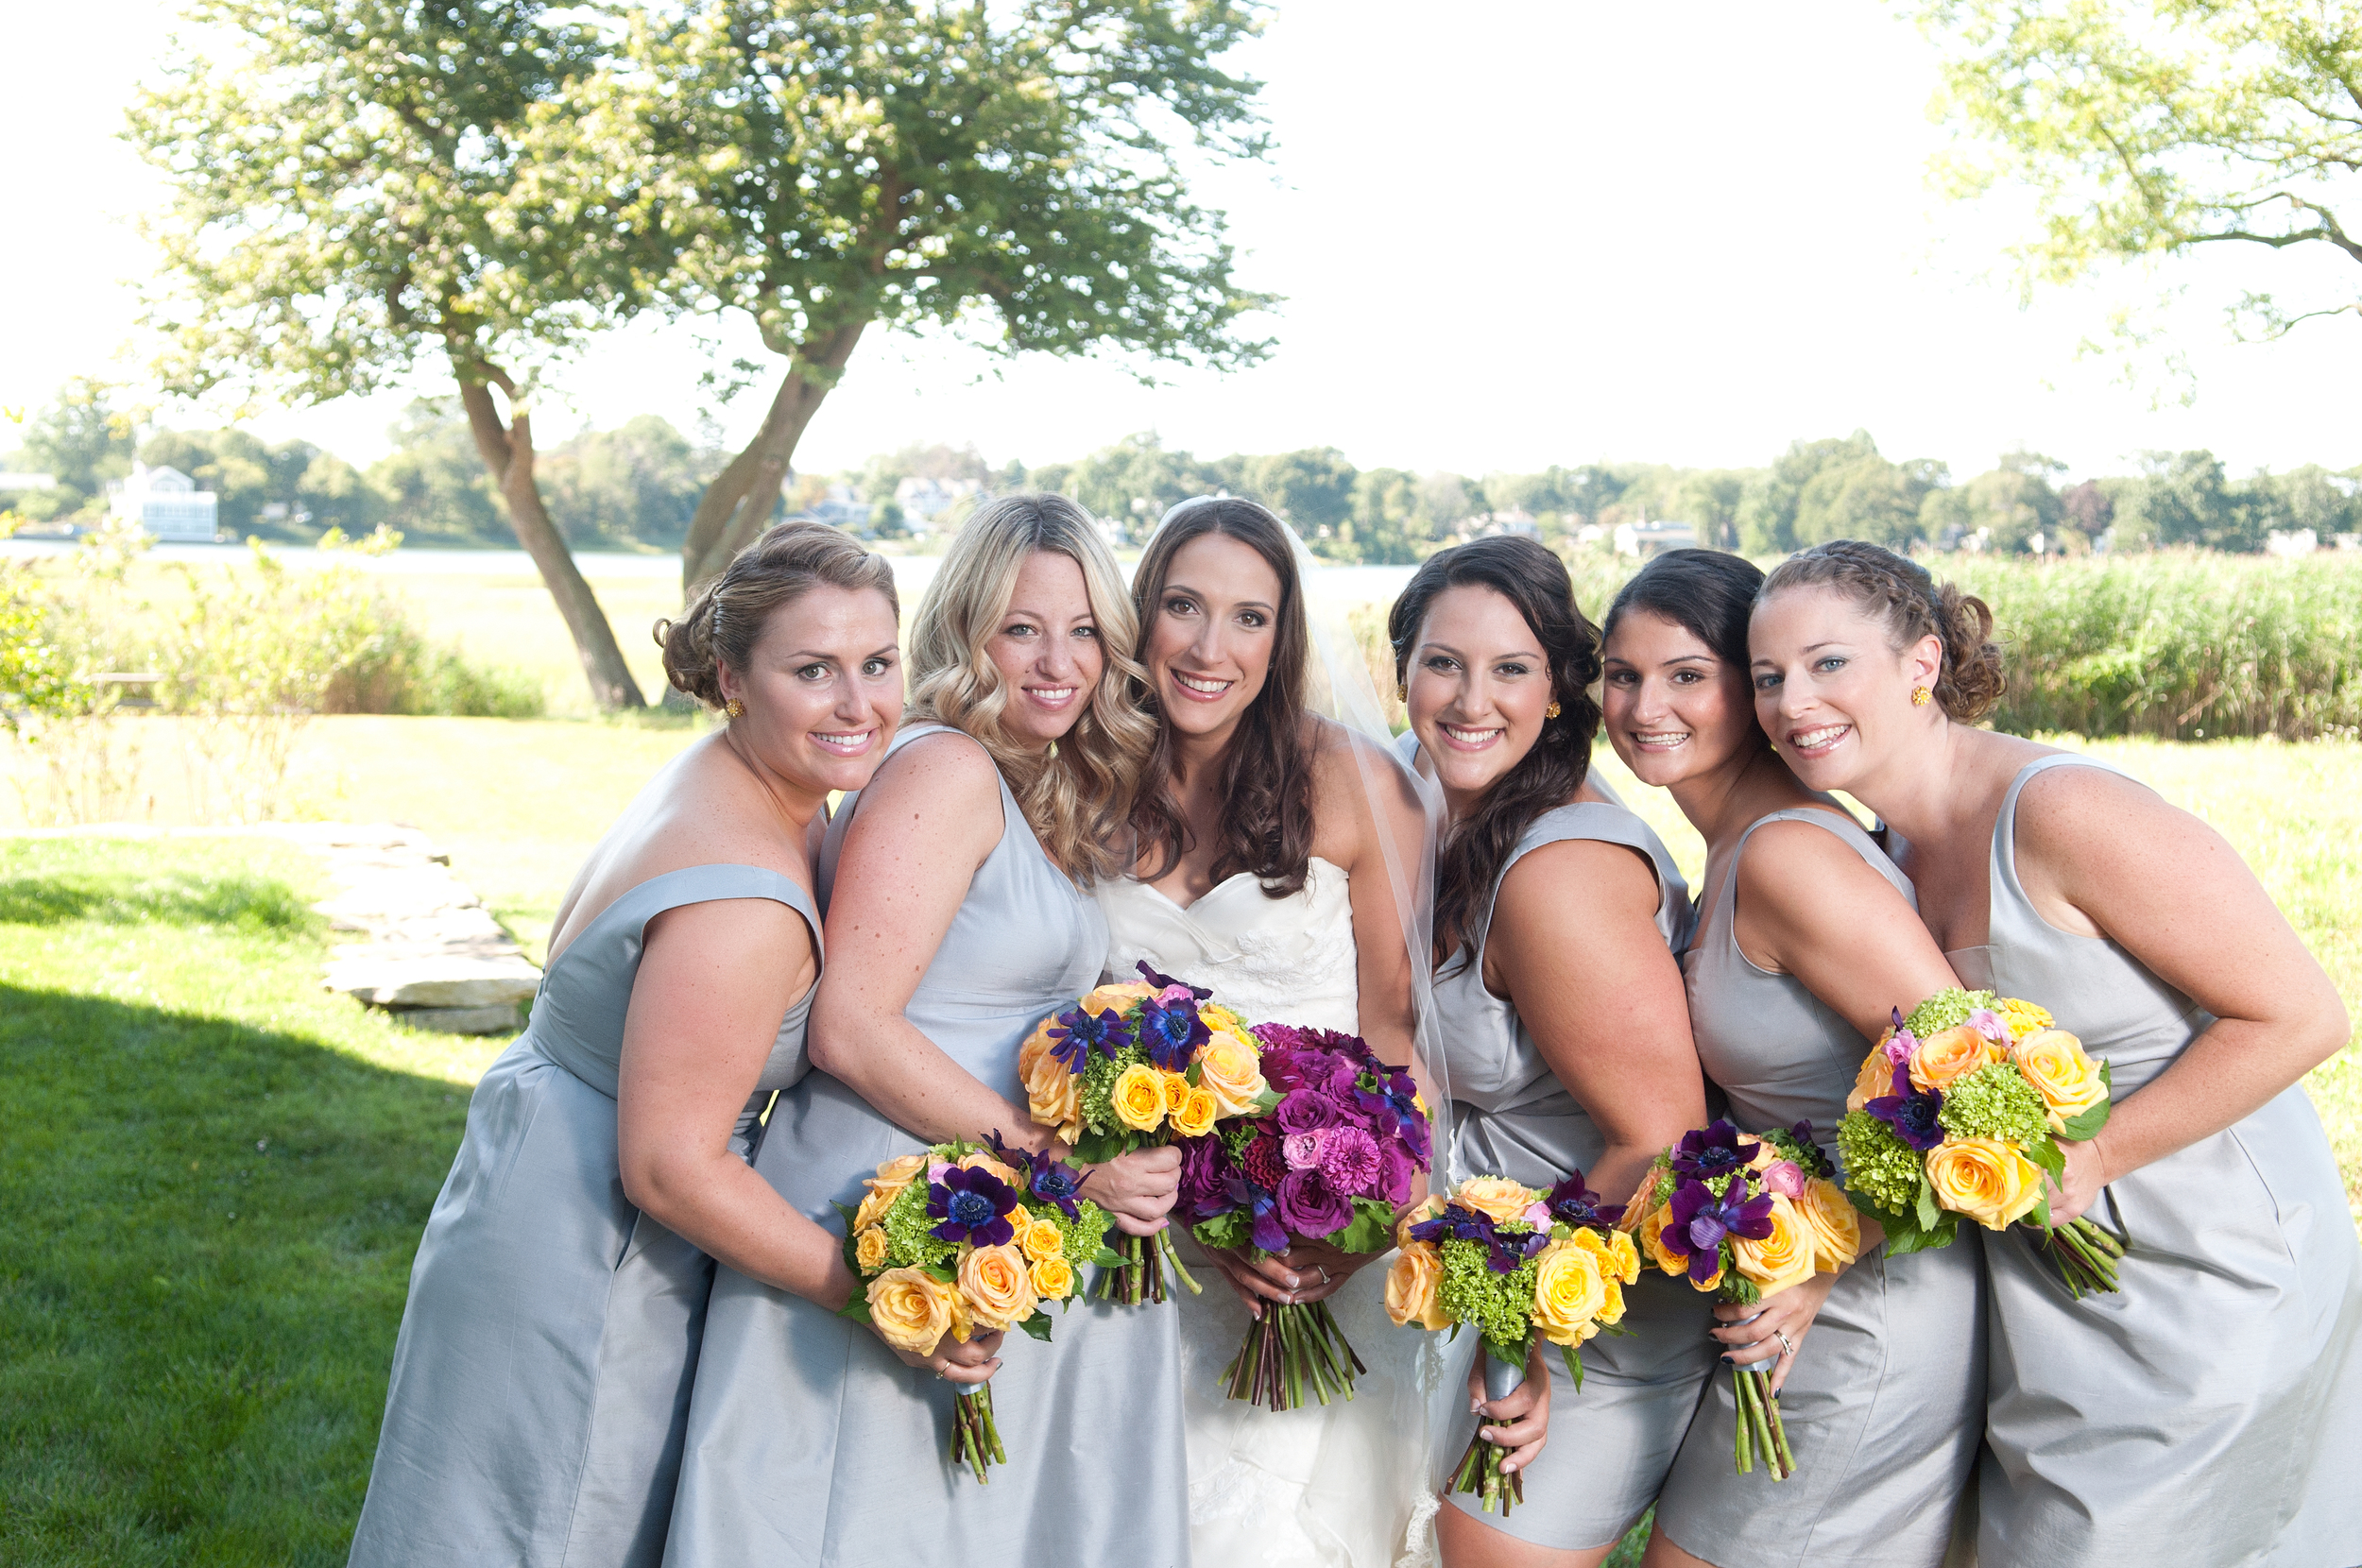 Angela_Chicoski_CT_wedding_photographer_106.jpg